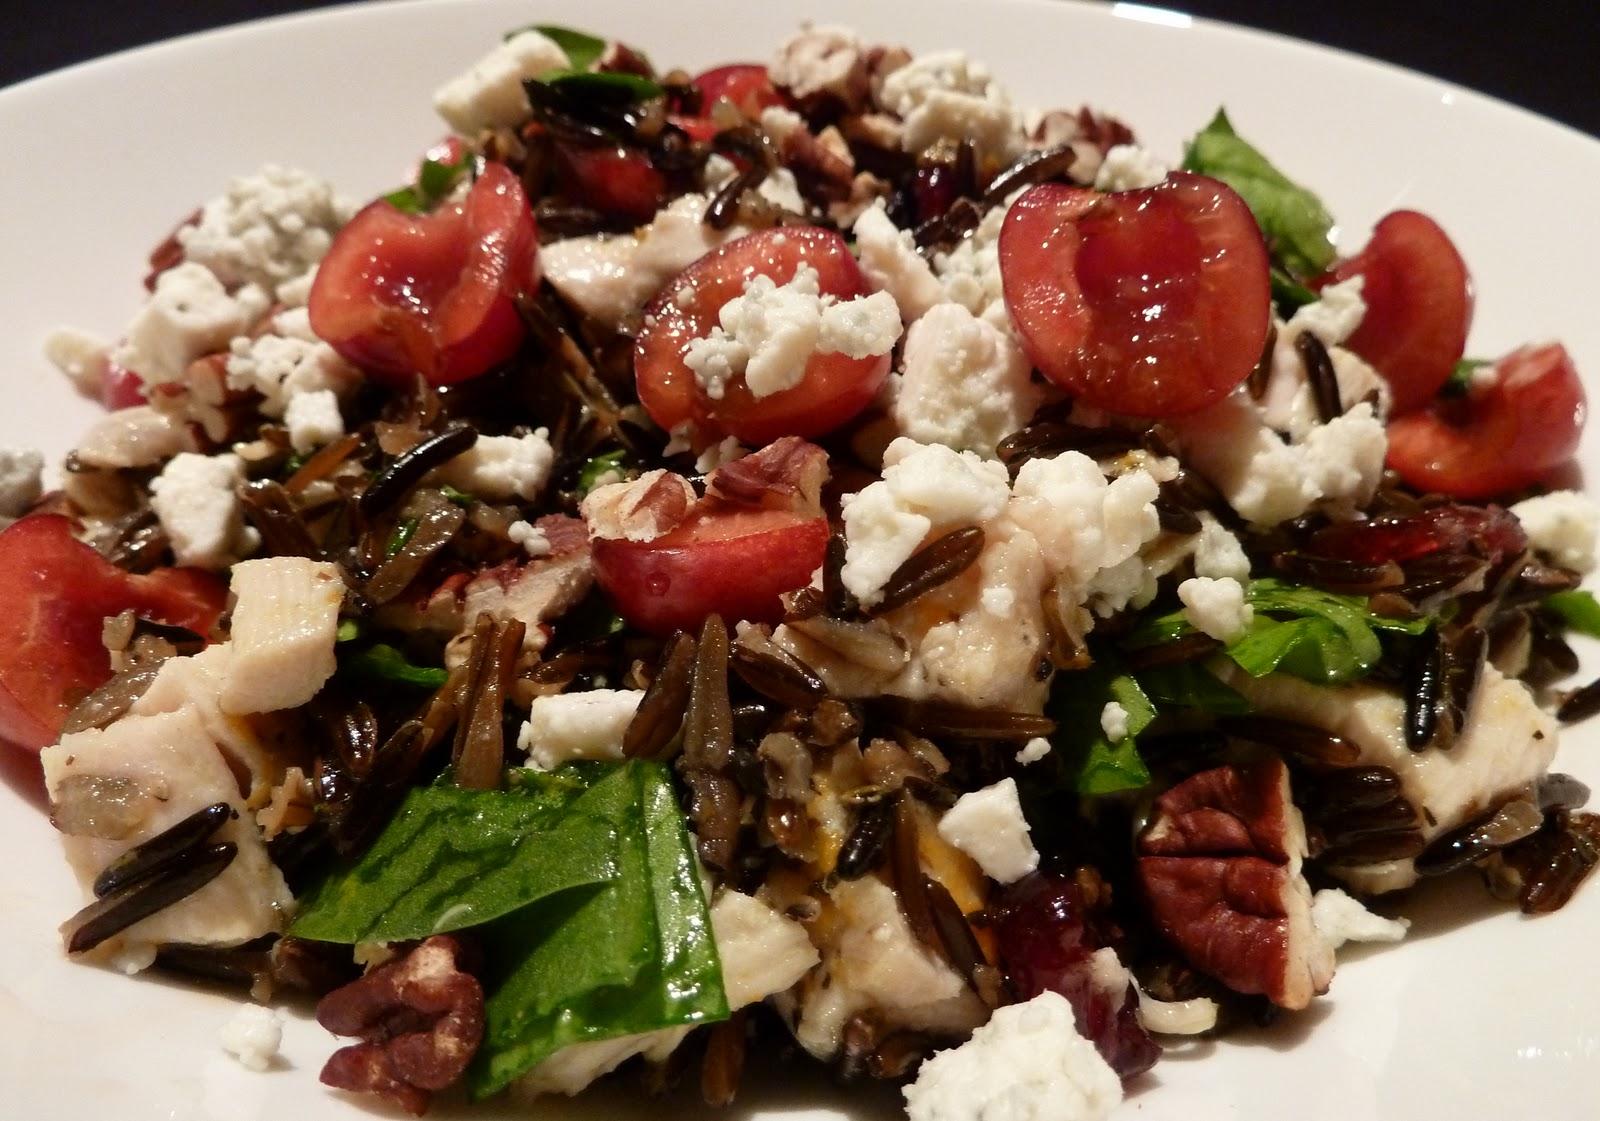 Cracked Pepper: Wild Rice Salad